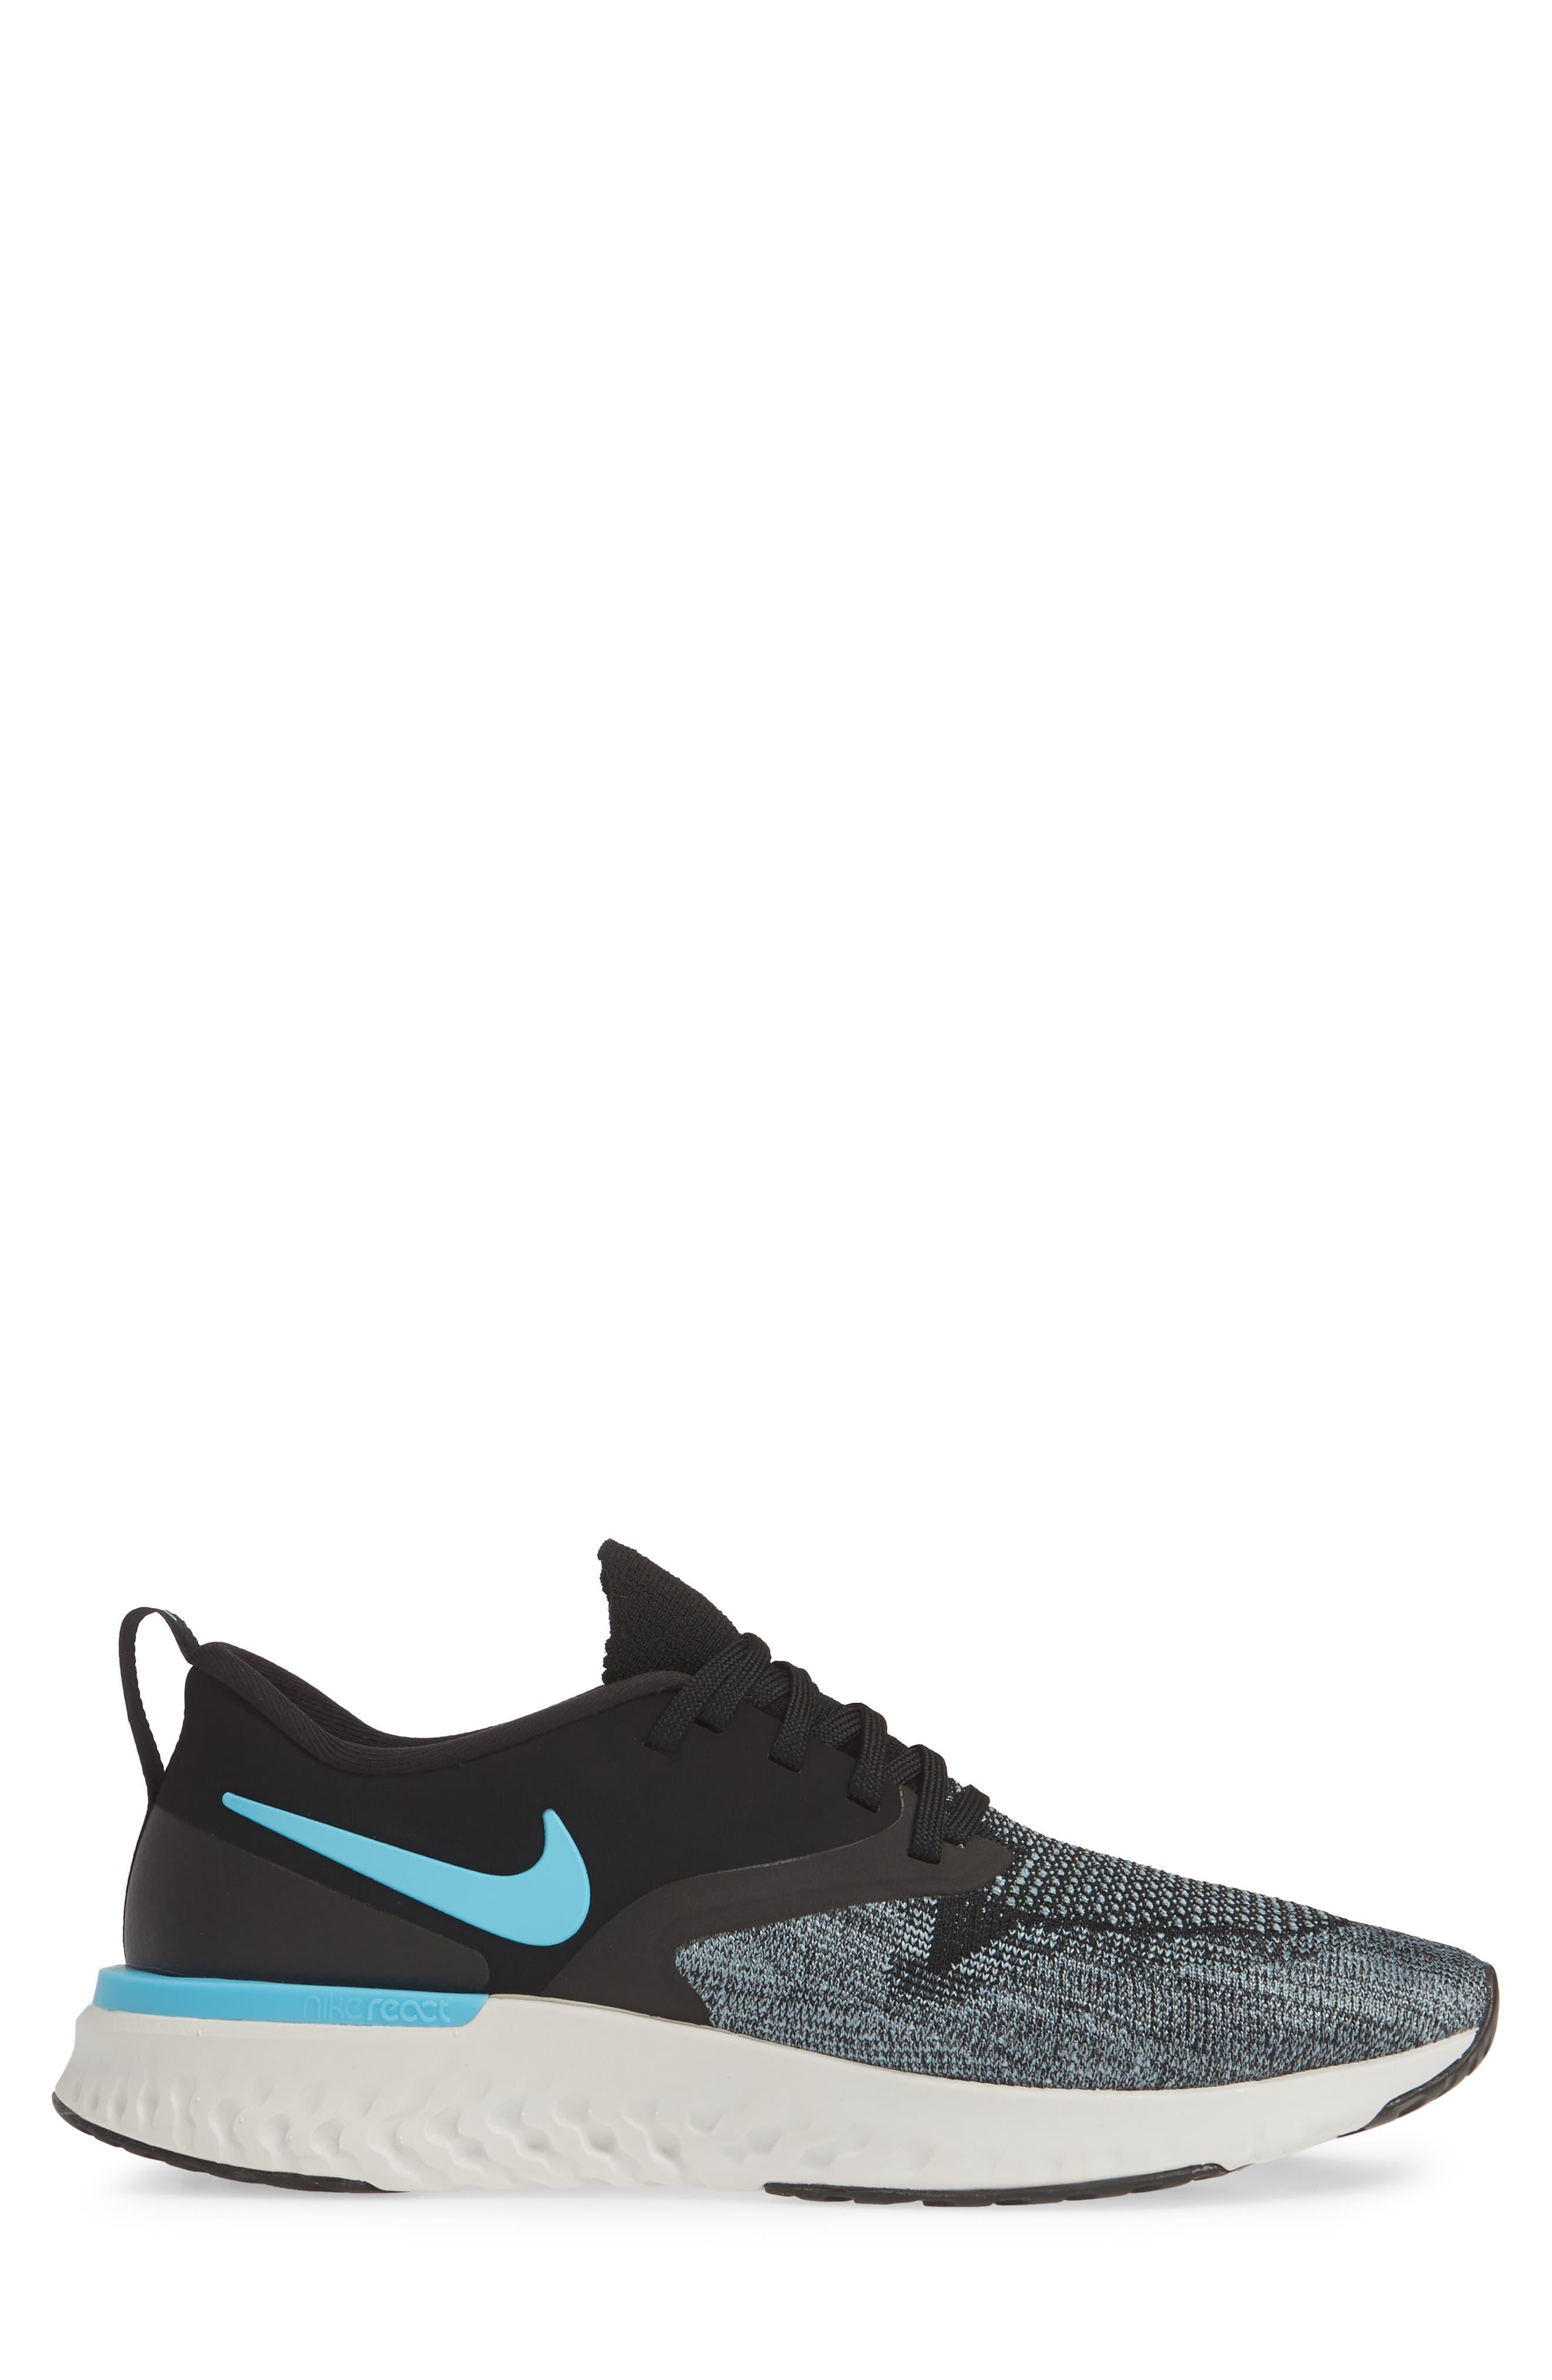 NIKE, Odyssey React 2 Flyknit Running Shoe, Alternate thumbnail 3, color, BLACK/ BLUE FURY/ AVIATOR GREY